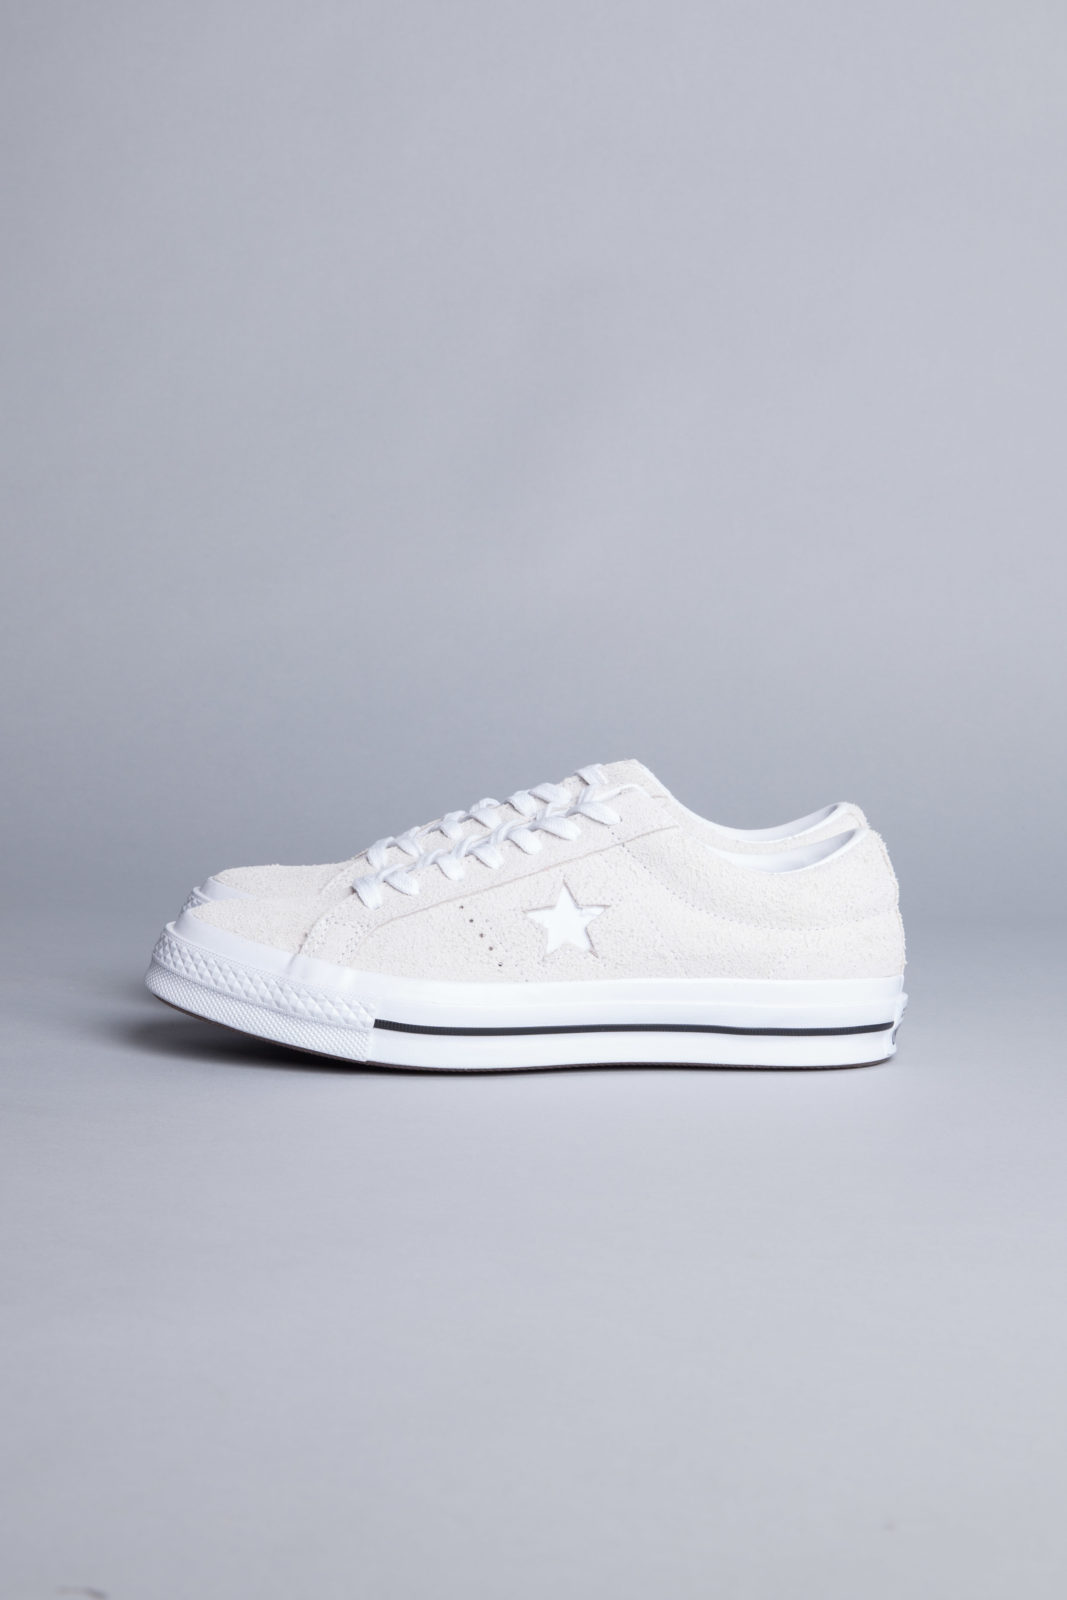 b341edbe2e8482 Converse One Star OX White Sneakers • Centreville Store